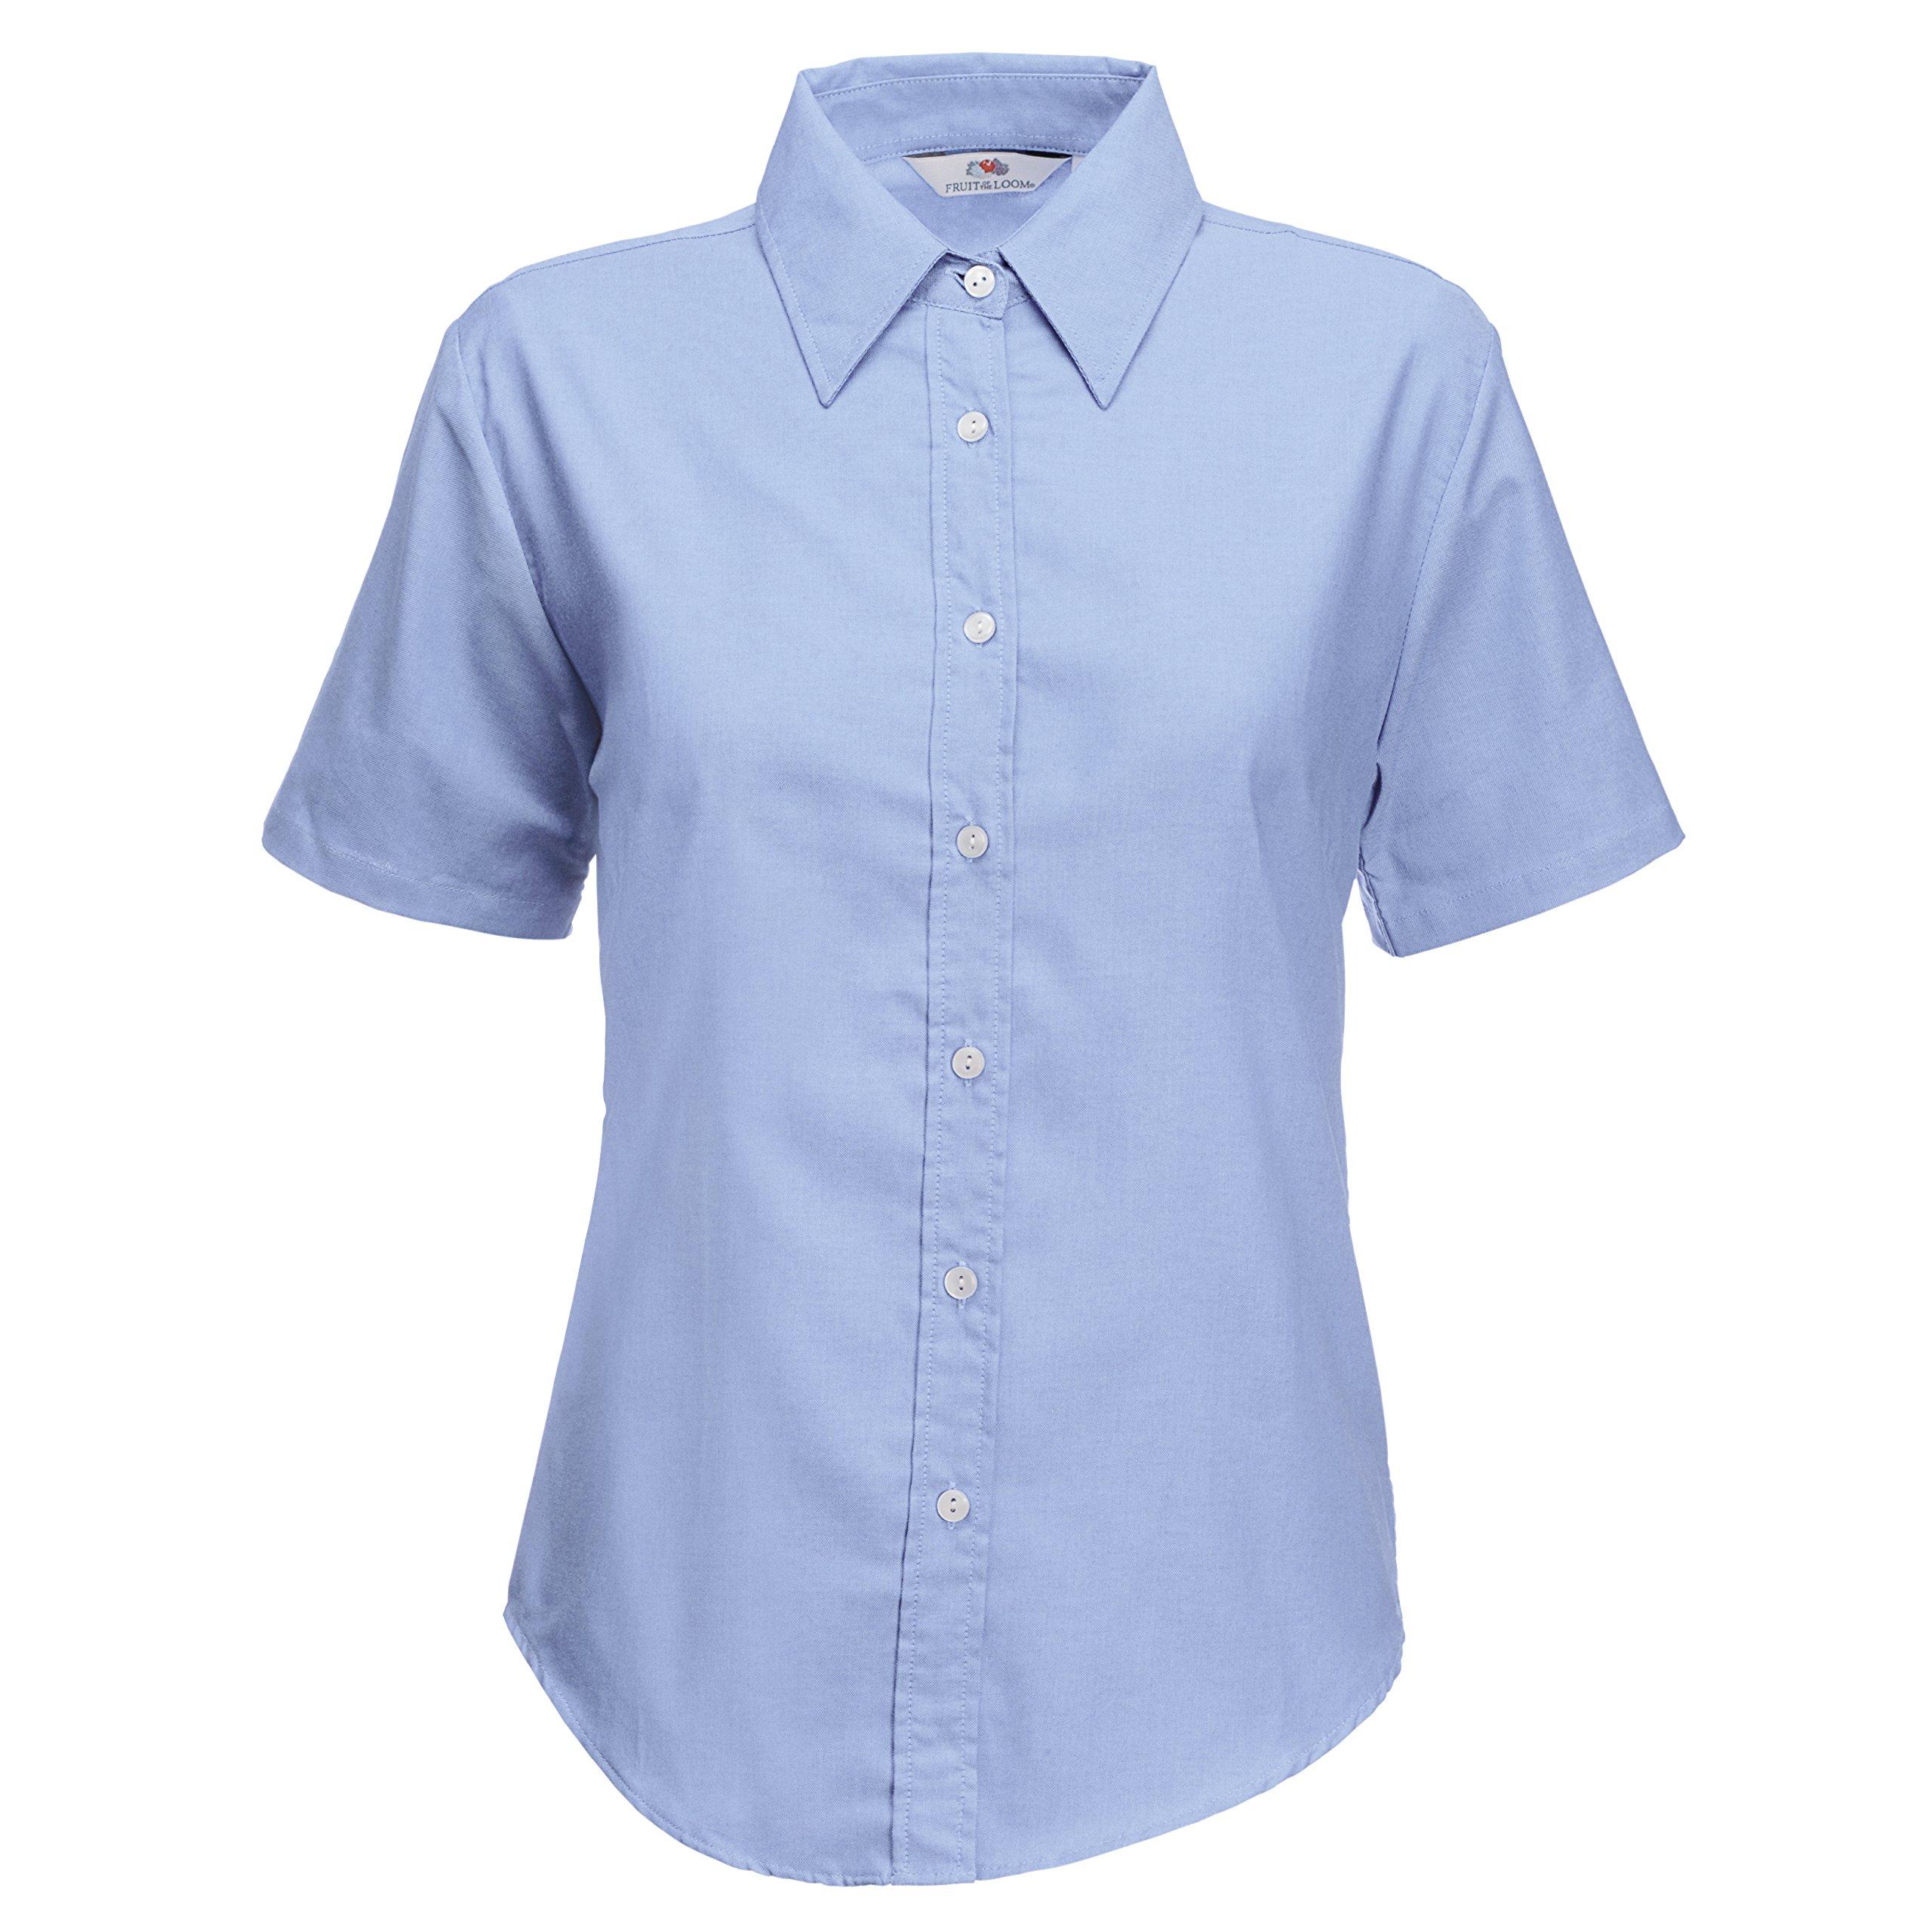 Onlyglobal Boys School Shirt Uniform Long Sleeve White Sky Blue Twin Pack Age 2-18 Year UK